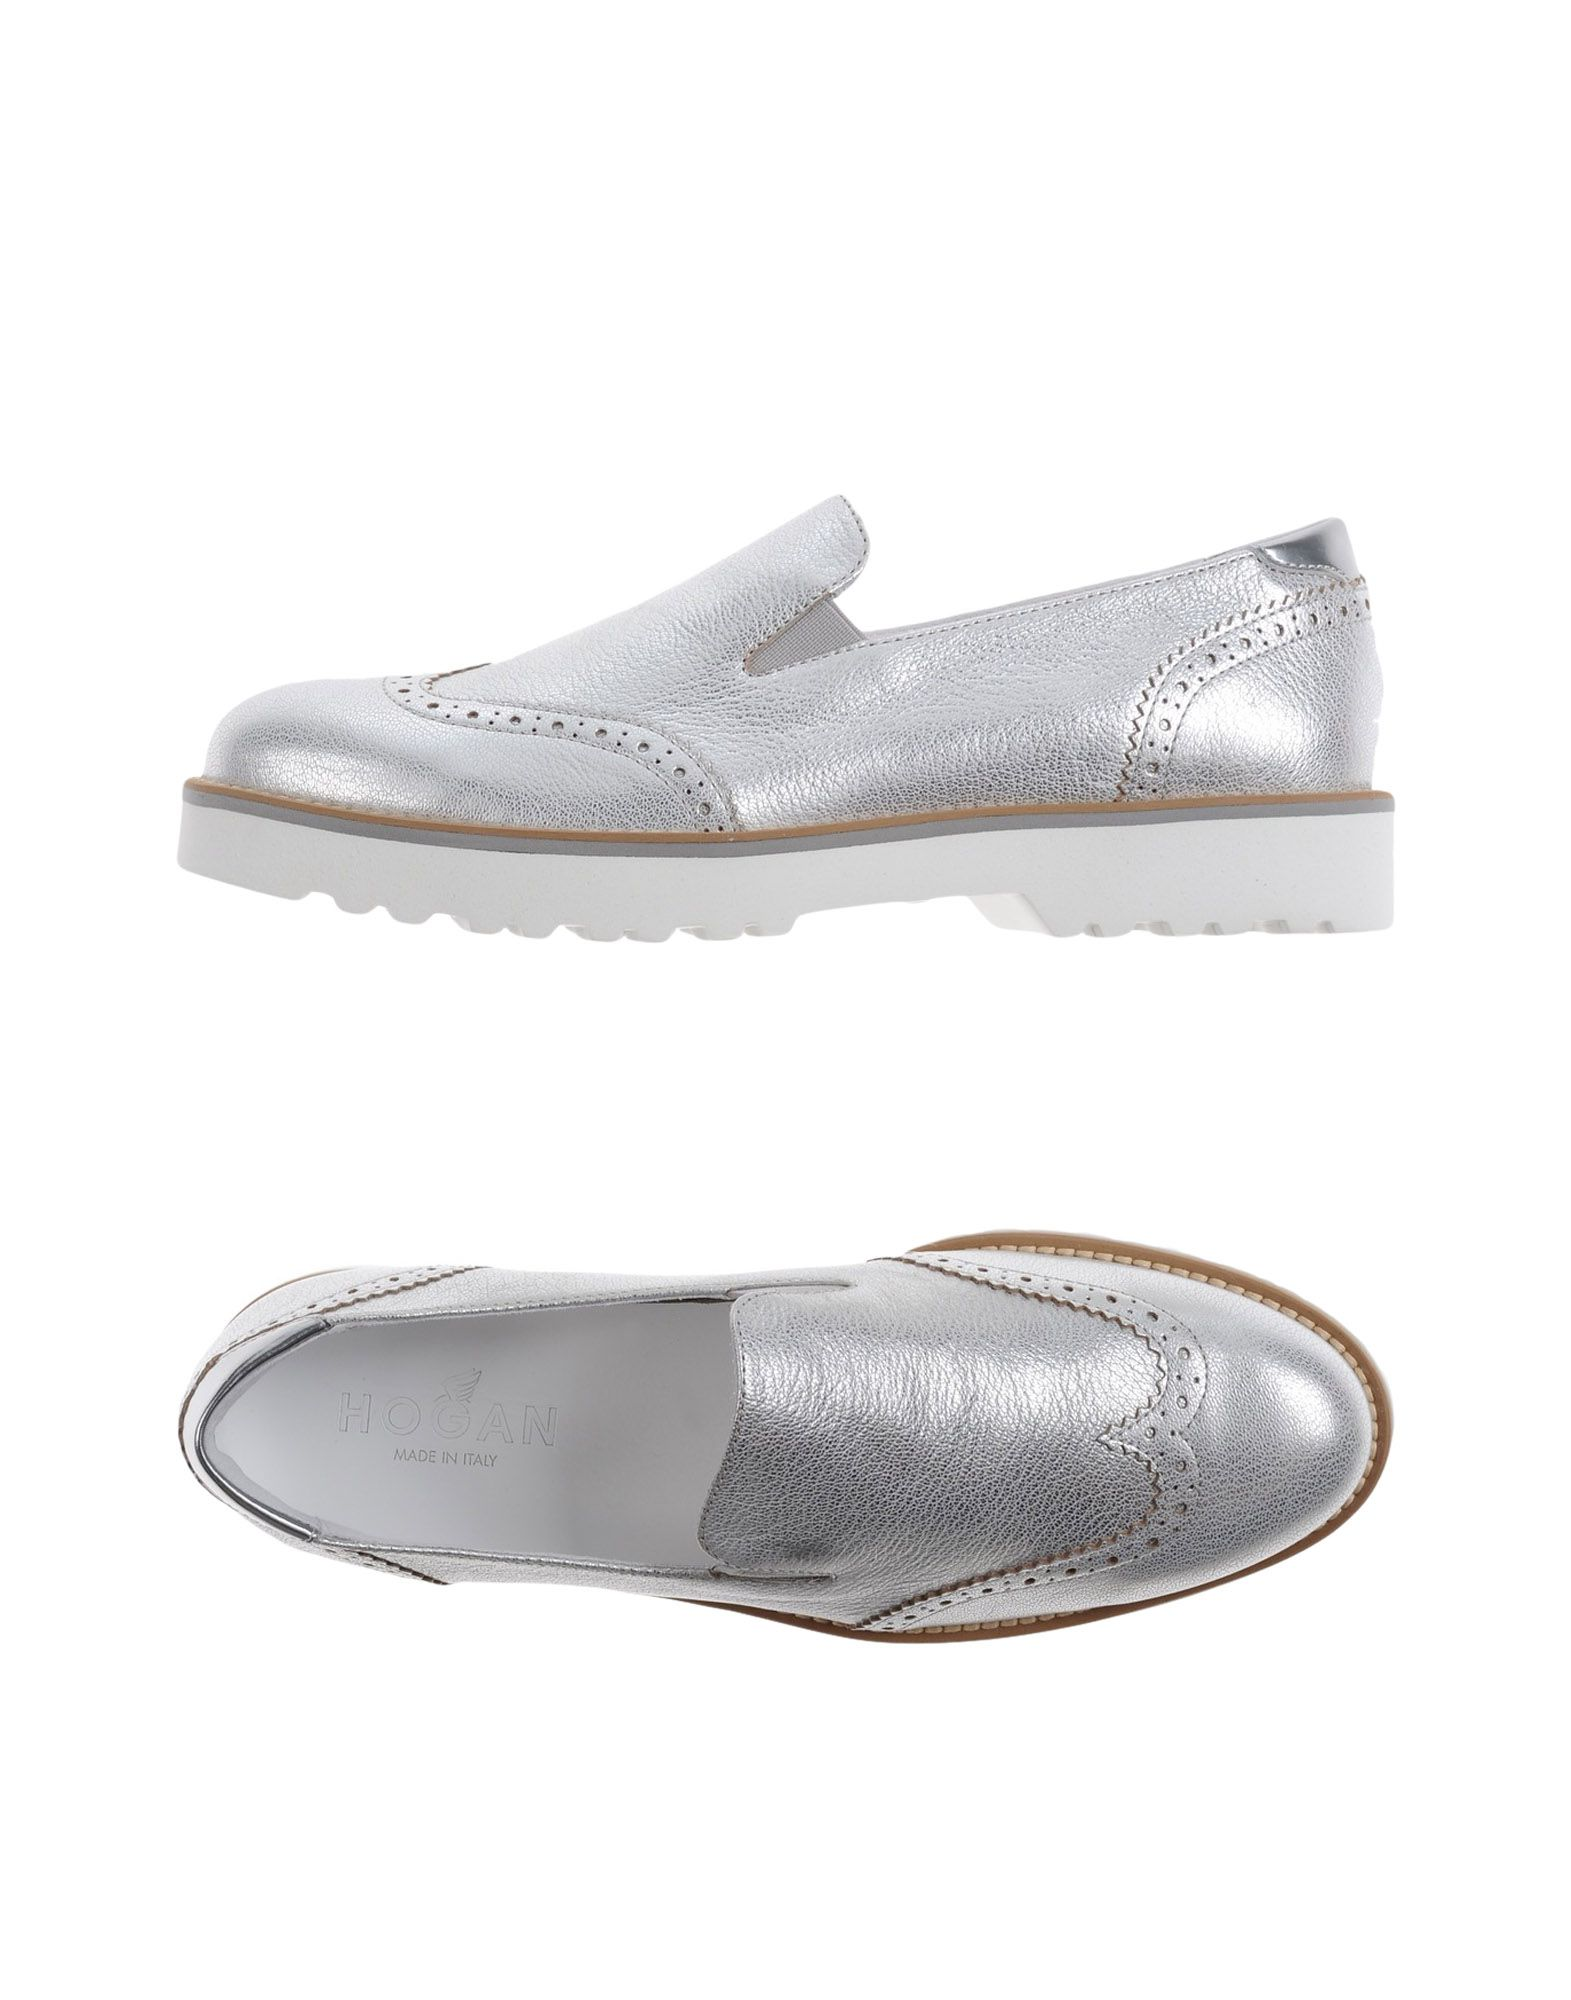 Hogan strapazierfähige Mokassins Damen  11157871PRGut aussehende strapazierfähige Hogan Schuhe abc0ee